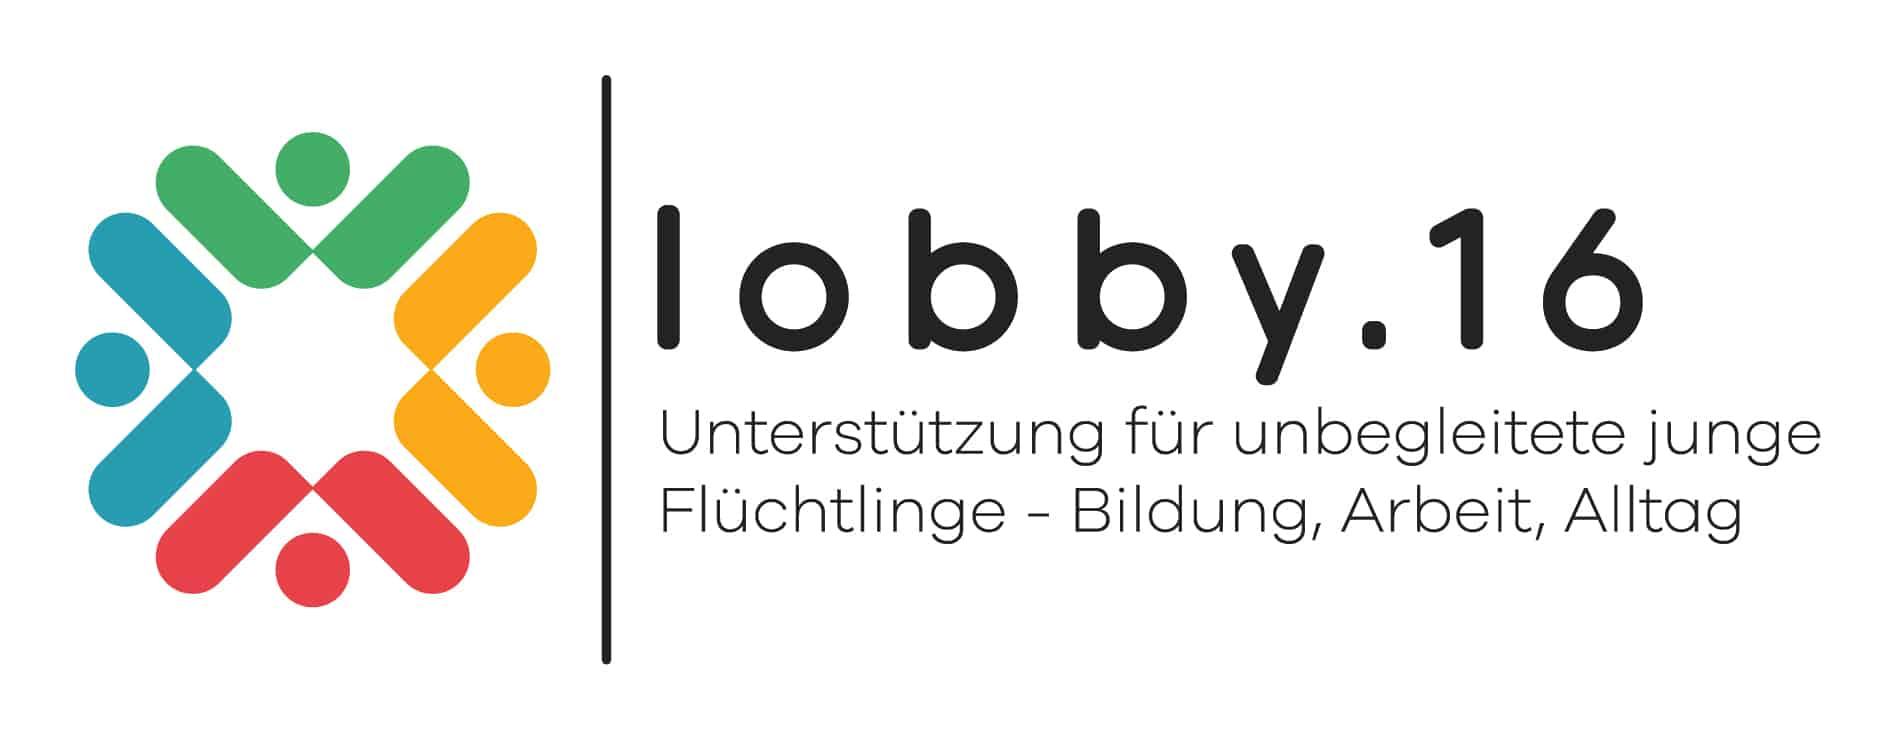 Verein lobby.16